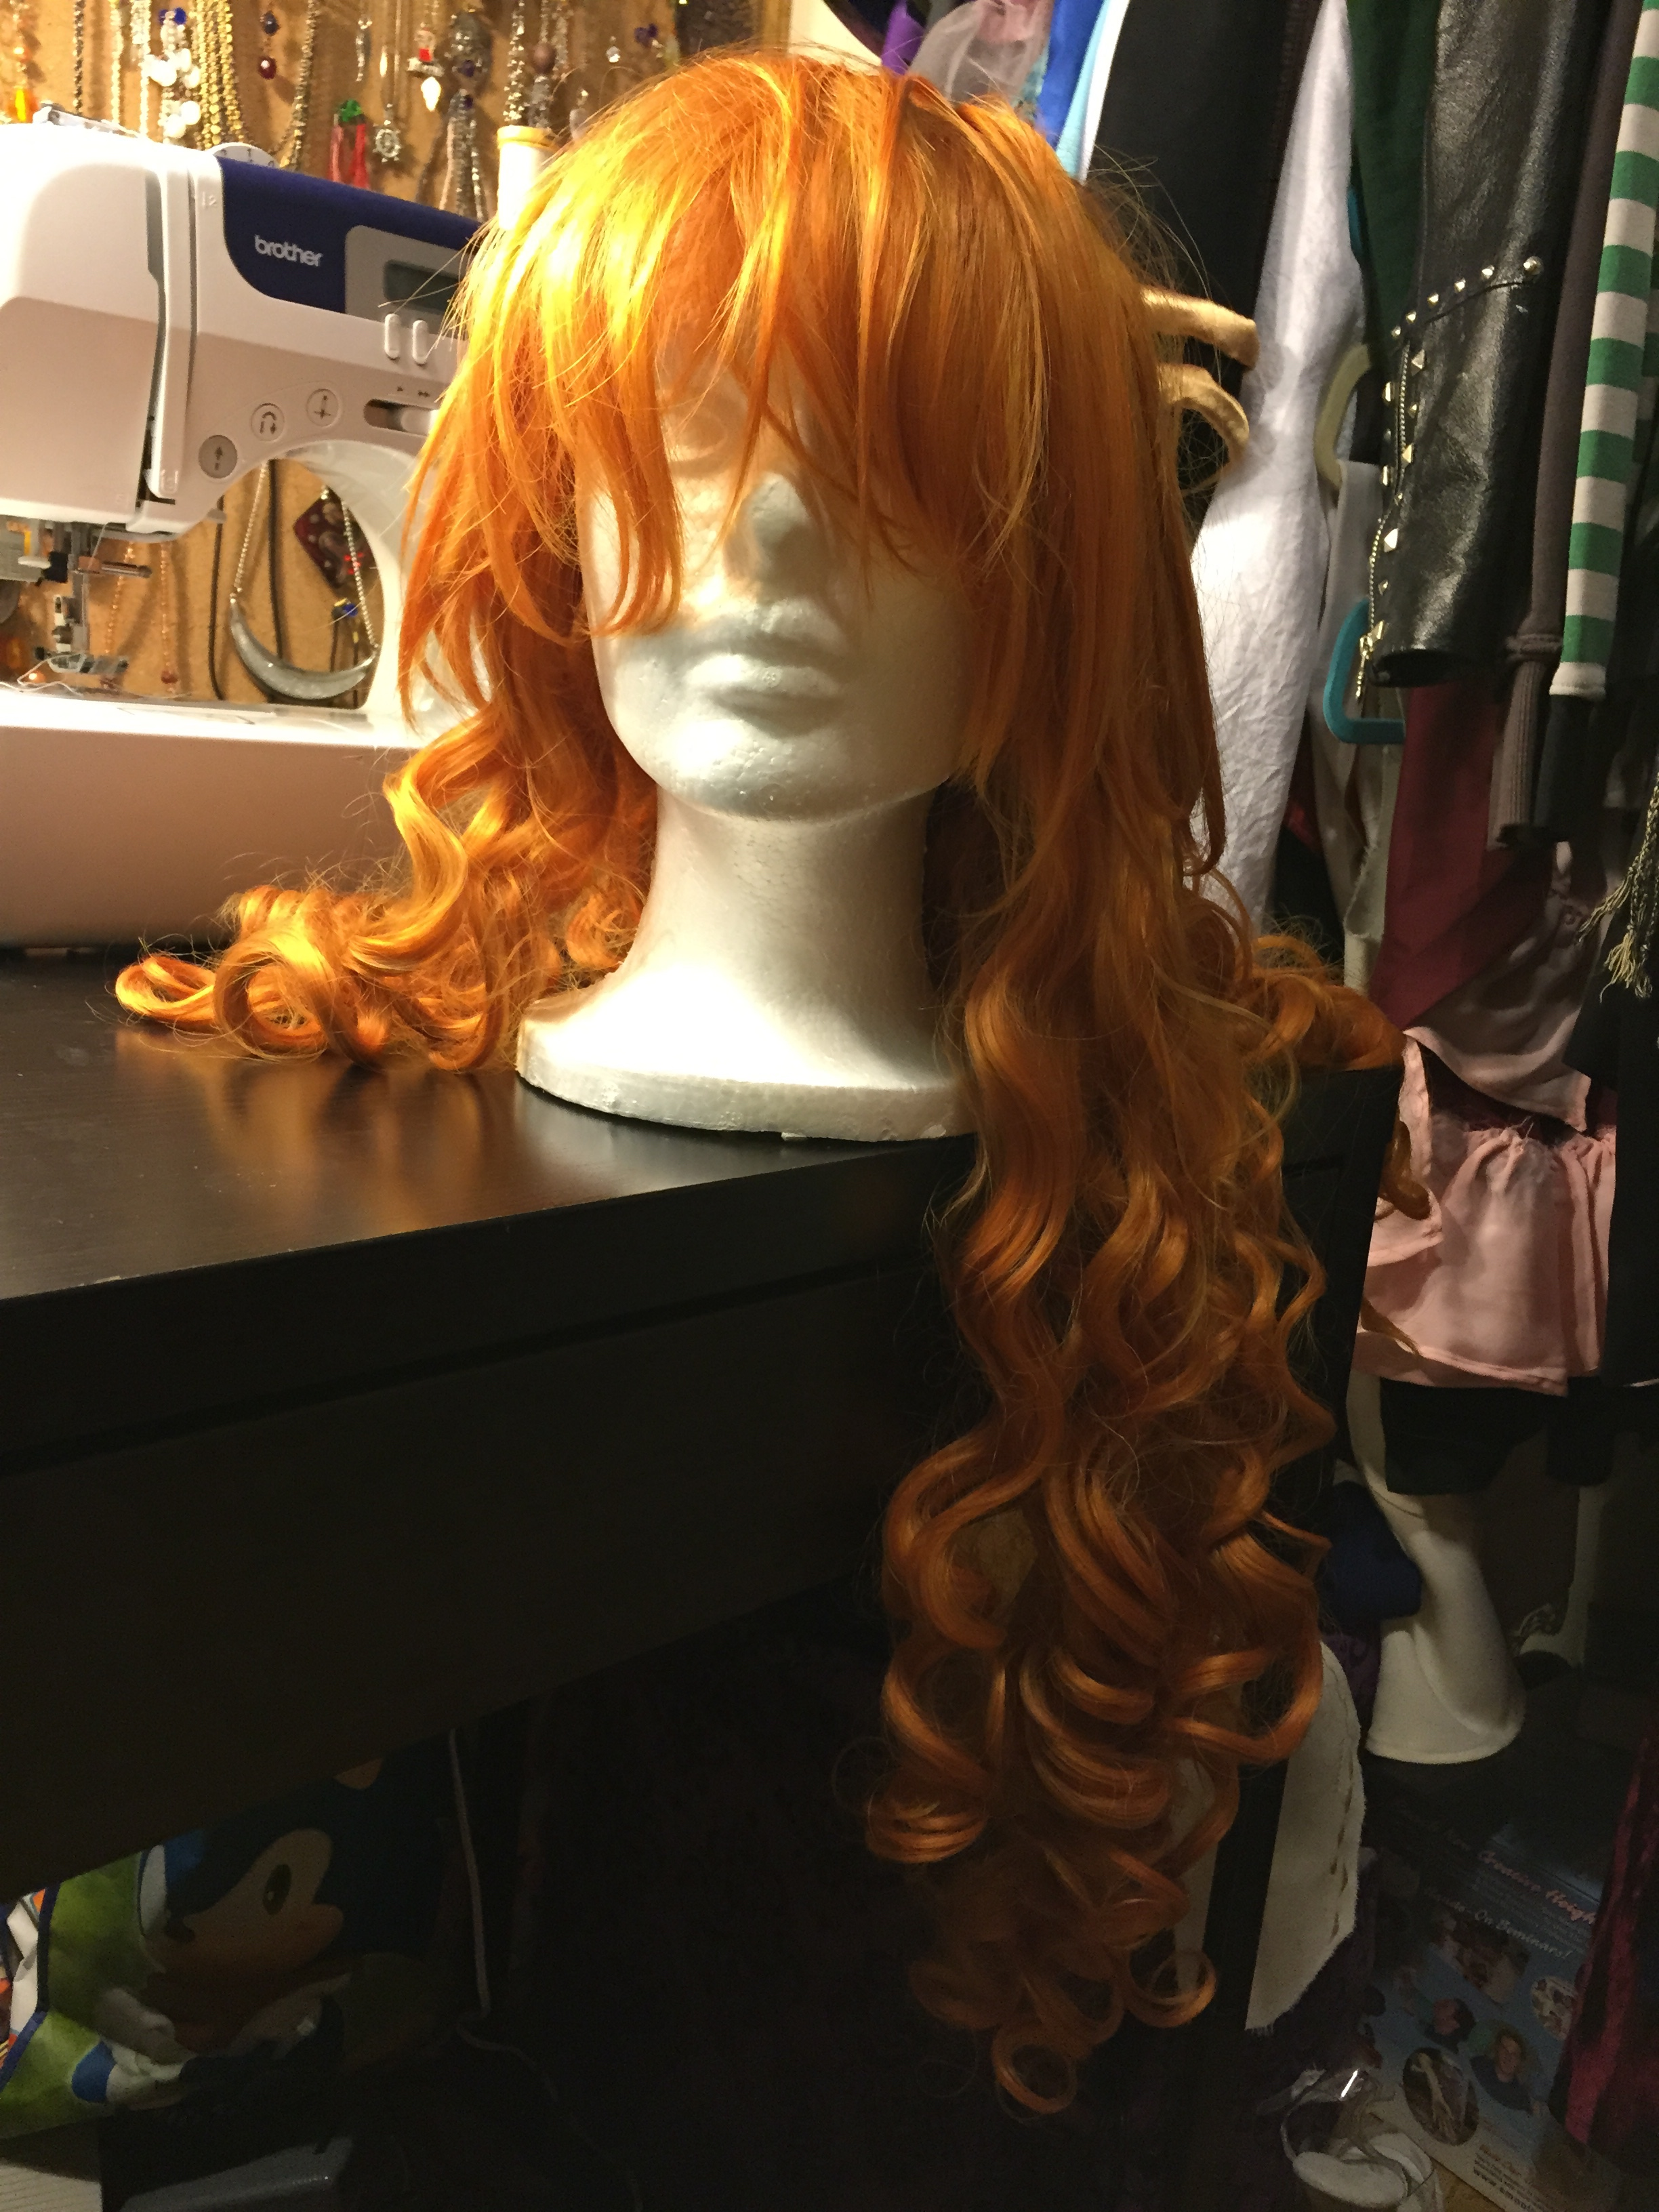 Orange Long Curly Wig (Ebay) · NekoNami Cosplay · Online Store ... 765f87bbf